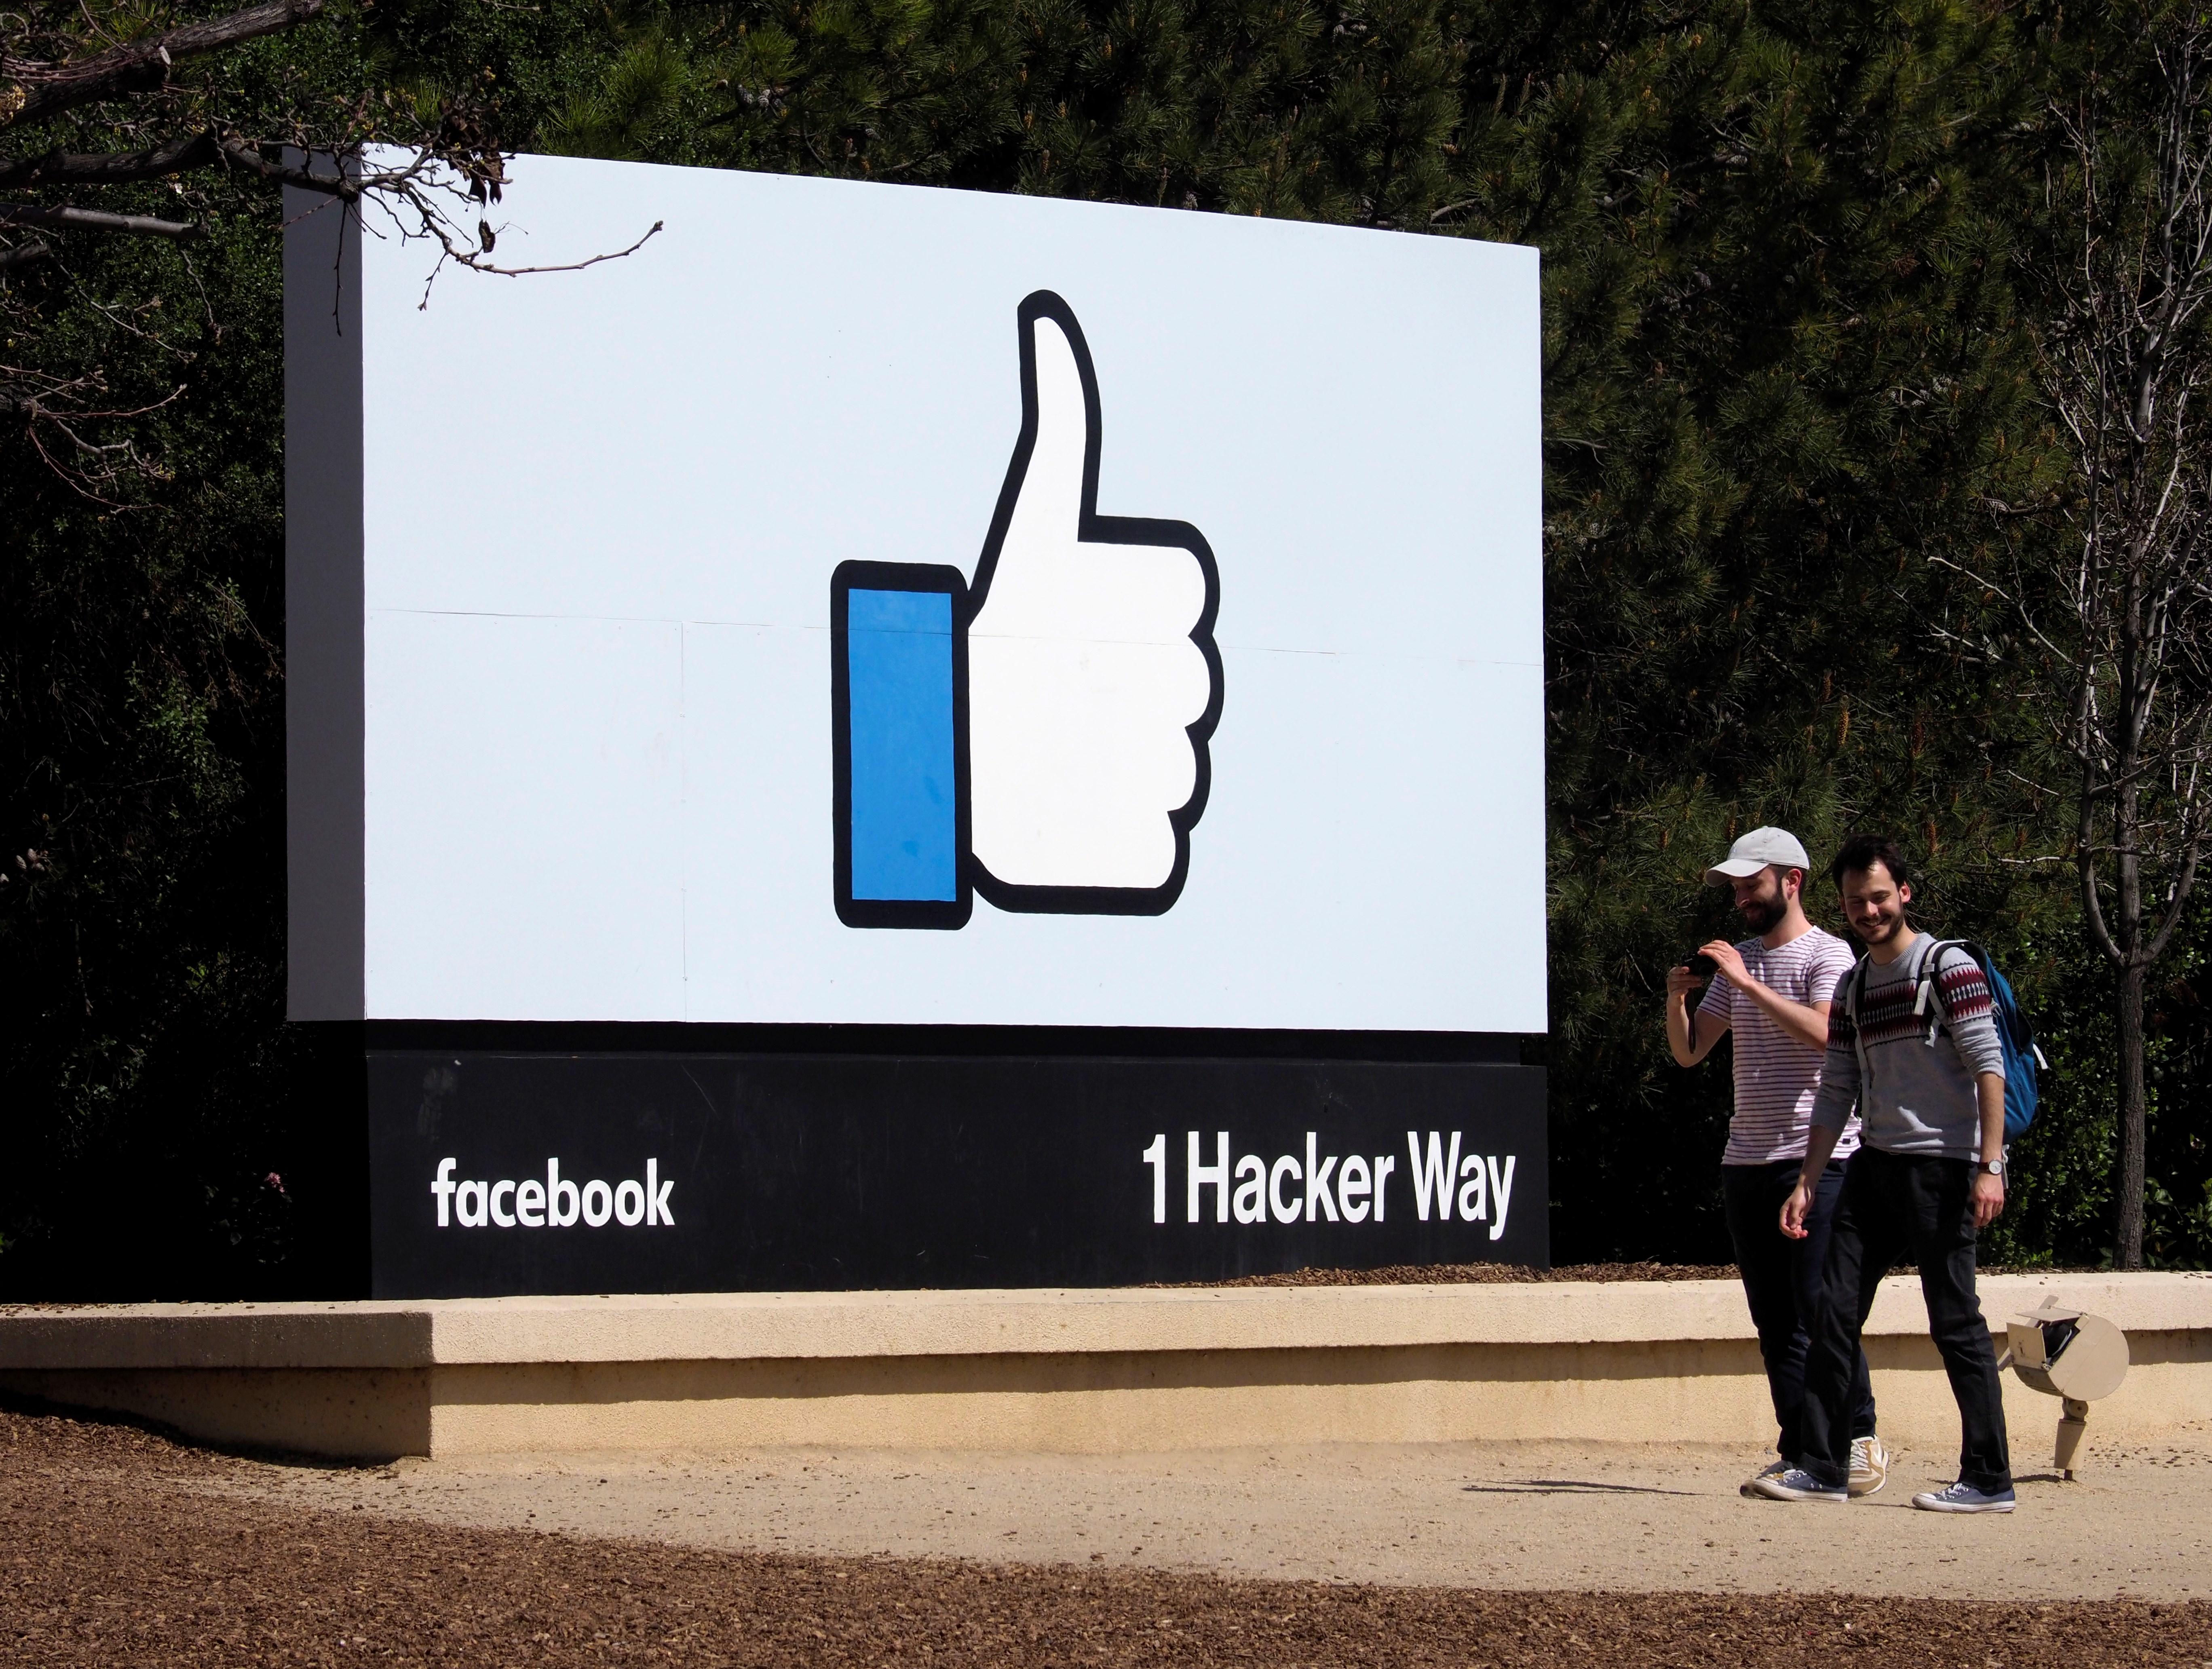 Facebook CEO: A HUGE MISTAKE